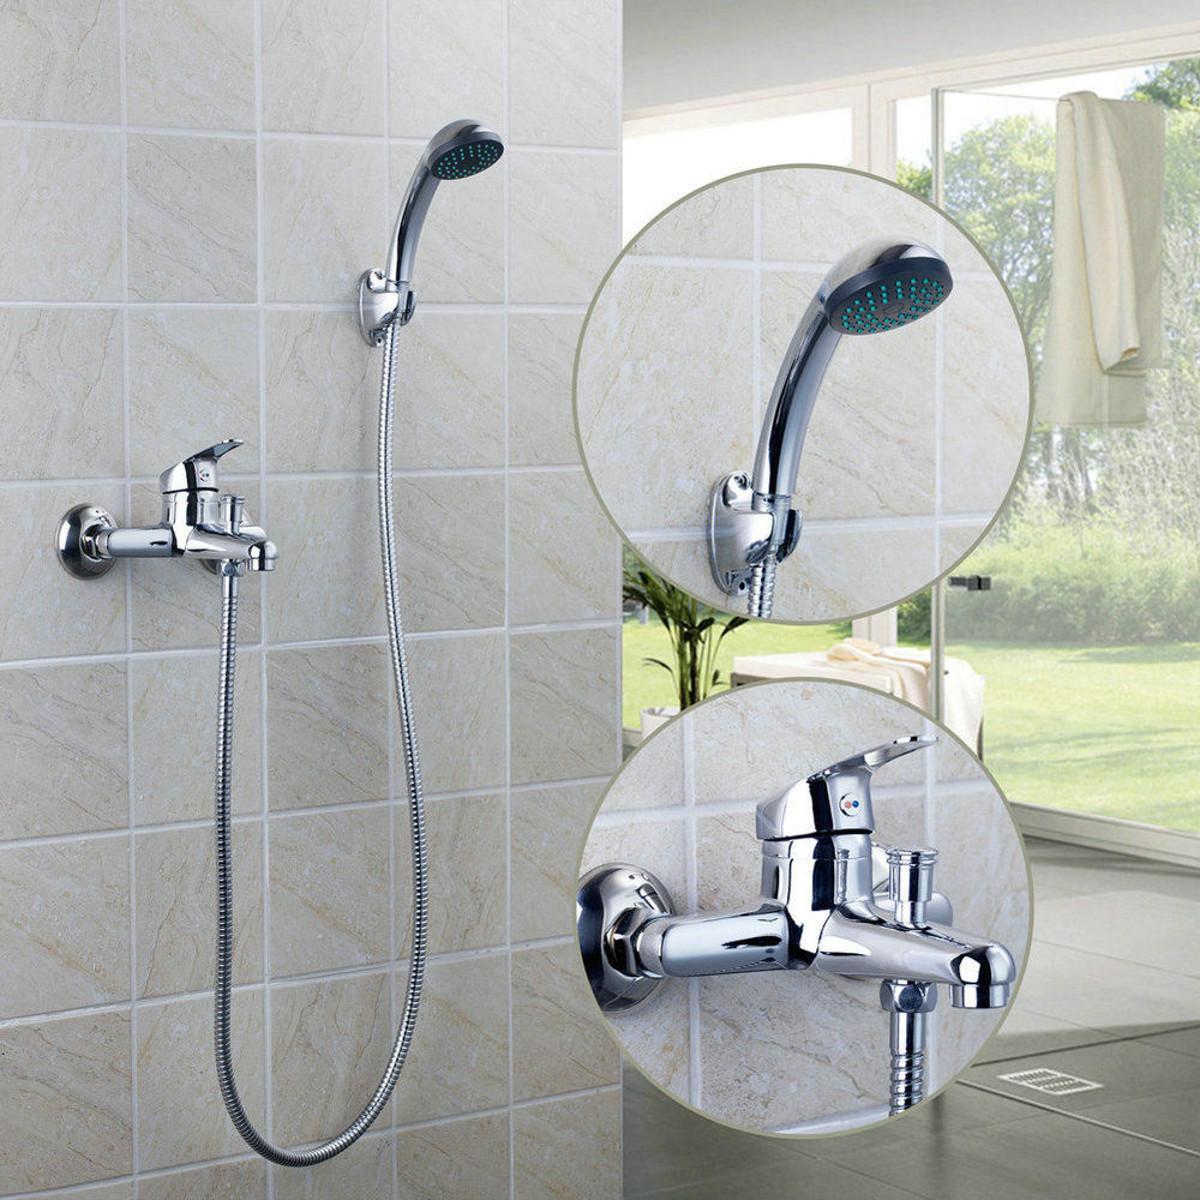 The Chrome Wall Mounted Bathroom Bathtub Shower Faucet Set Mixer